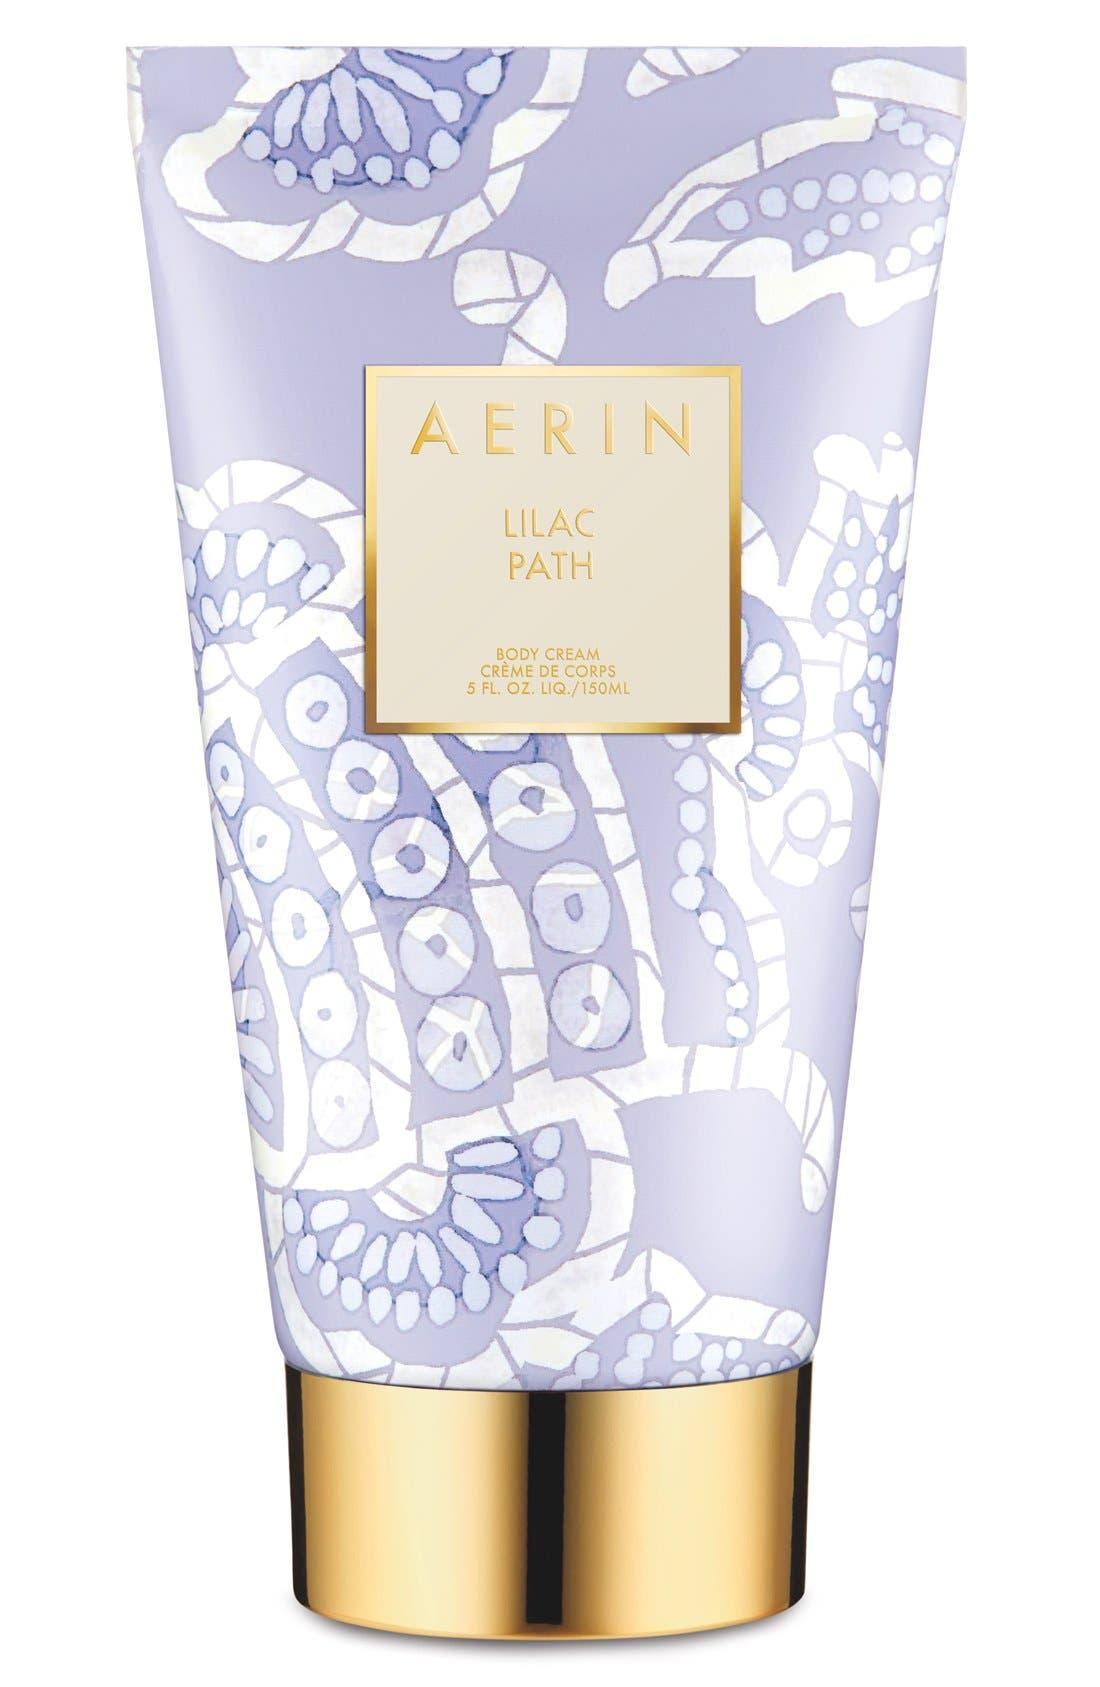 AERIN Beauty Lilac Path Body Cream,                             Main thumbnail 1, color,                             NO COLOR